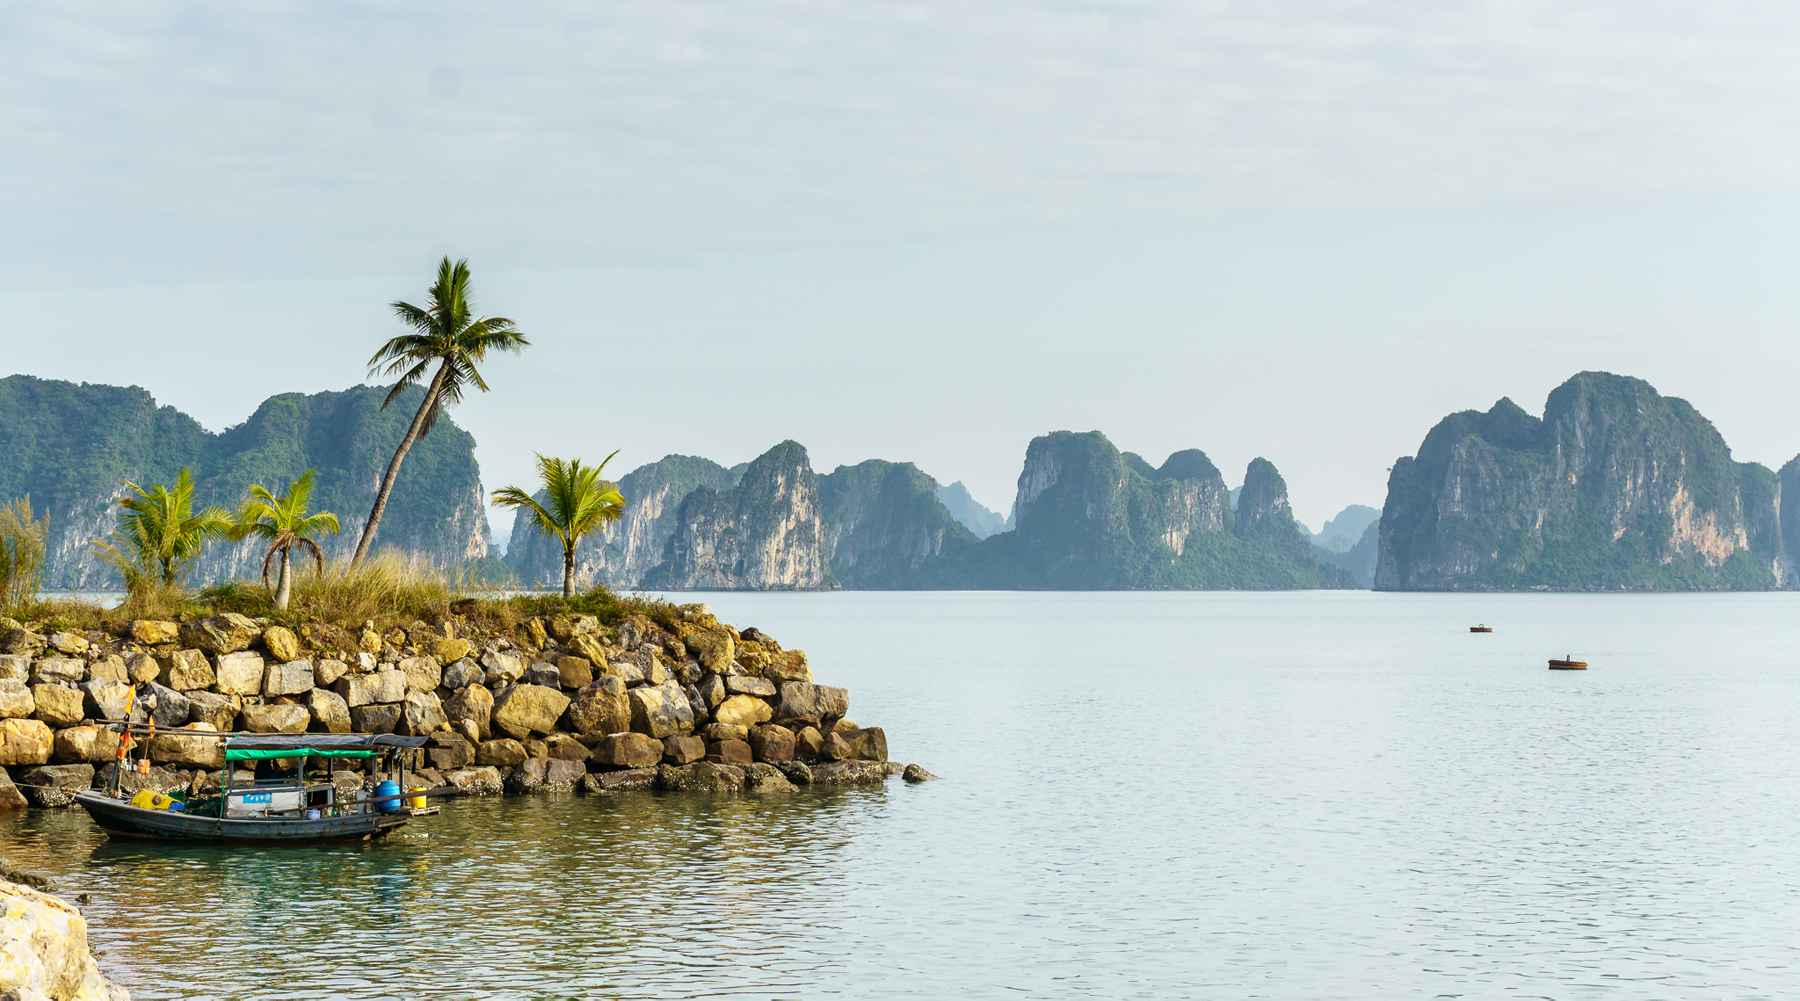 Tuan Chau island in Halong Bay